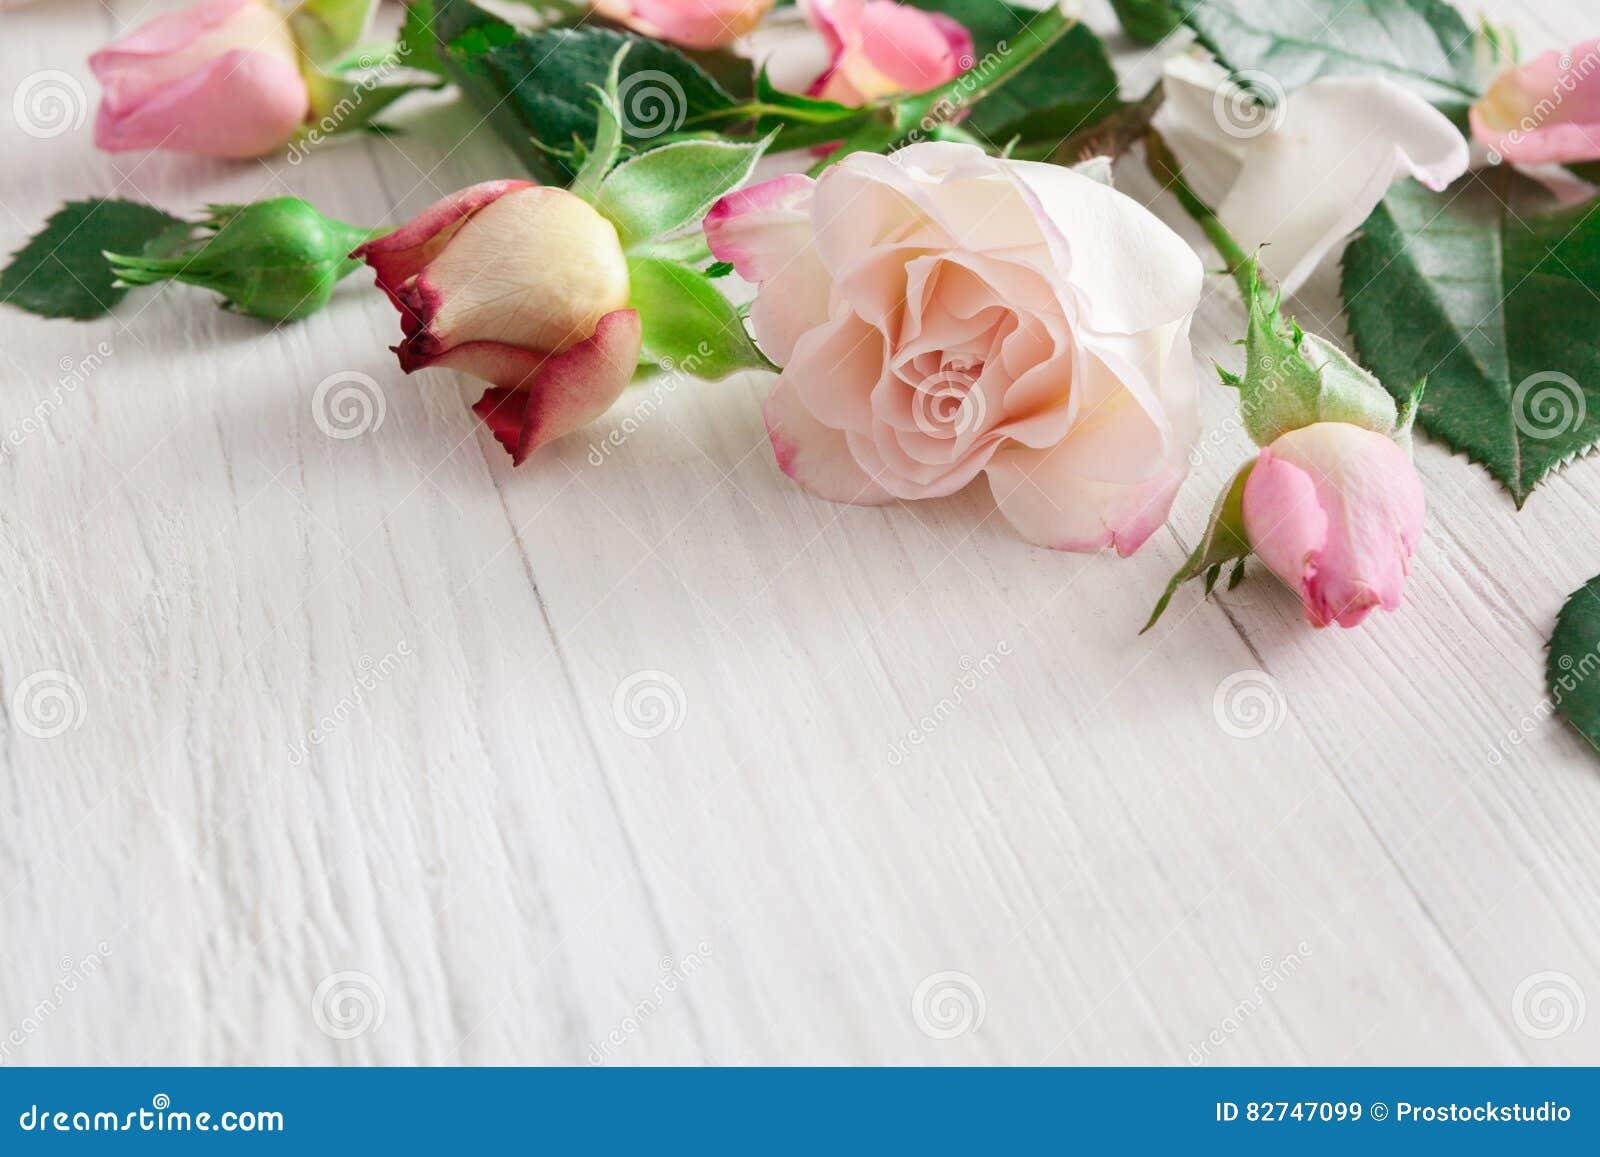 Fondo De Madera Vintage Con Flores Blancas Manzana Y: Valentine Day Background, Rose Flowers On White Wood Stock